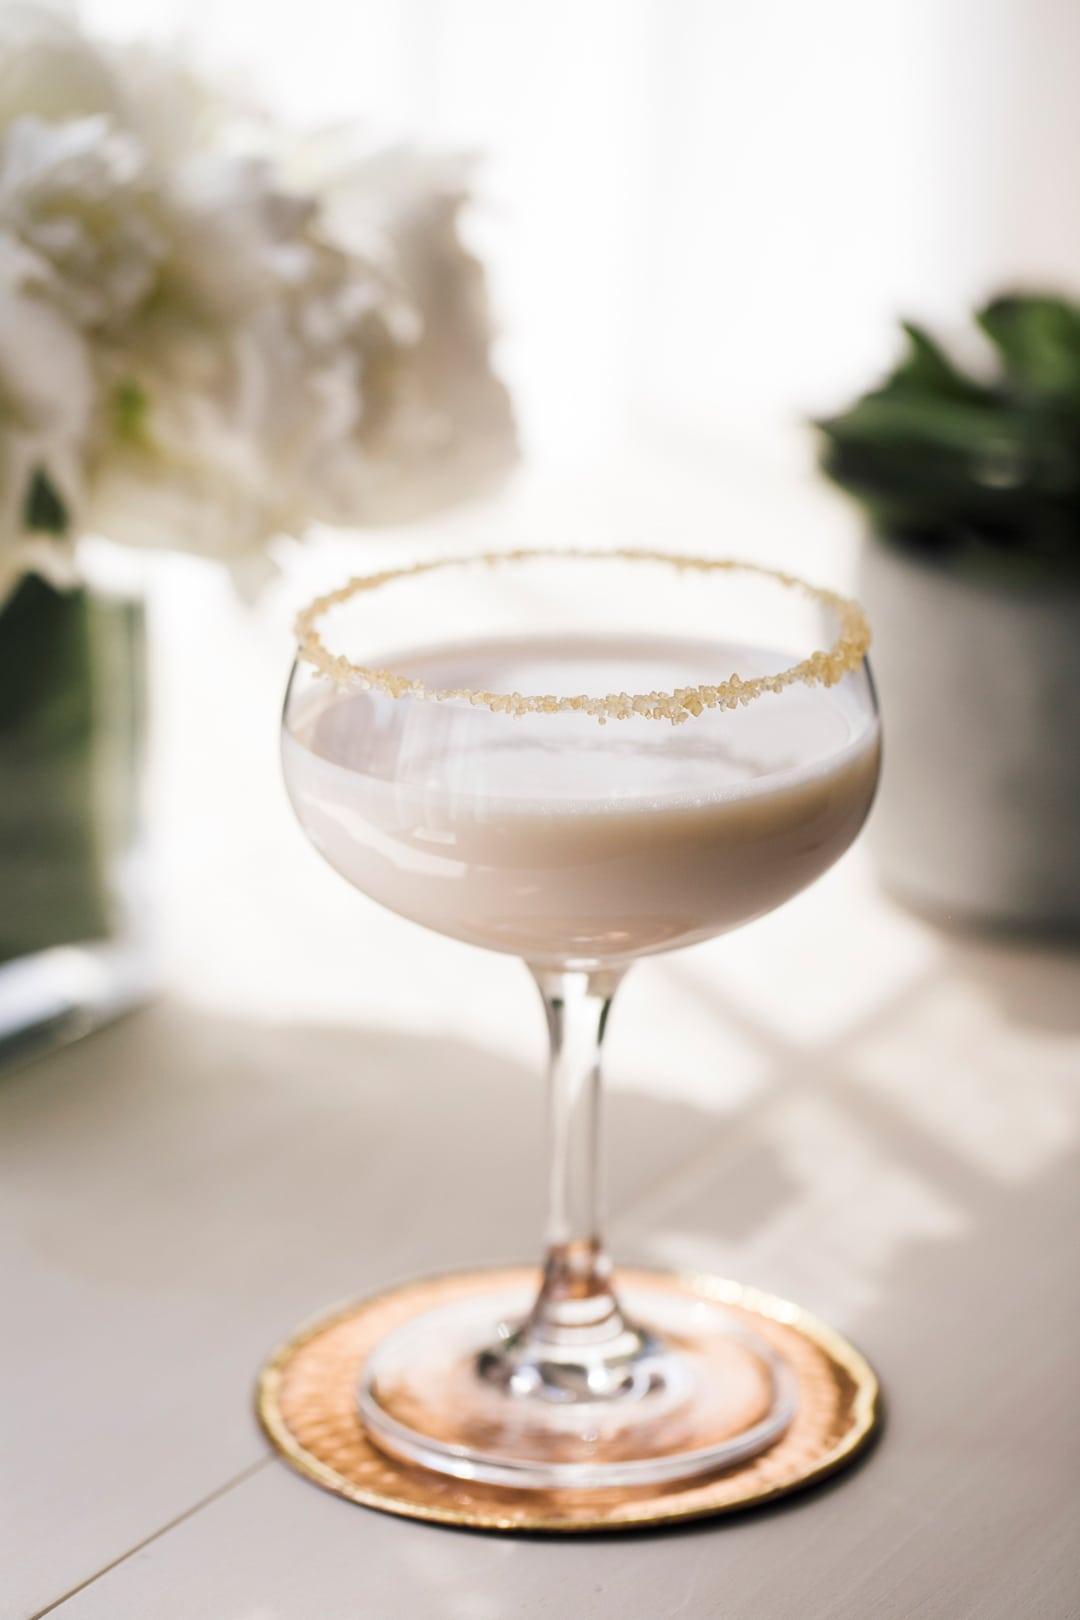 Sweet Harbor Mist Bailey's Almande Cocktail